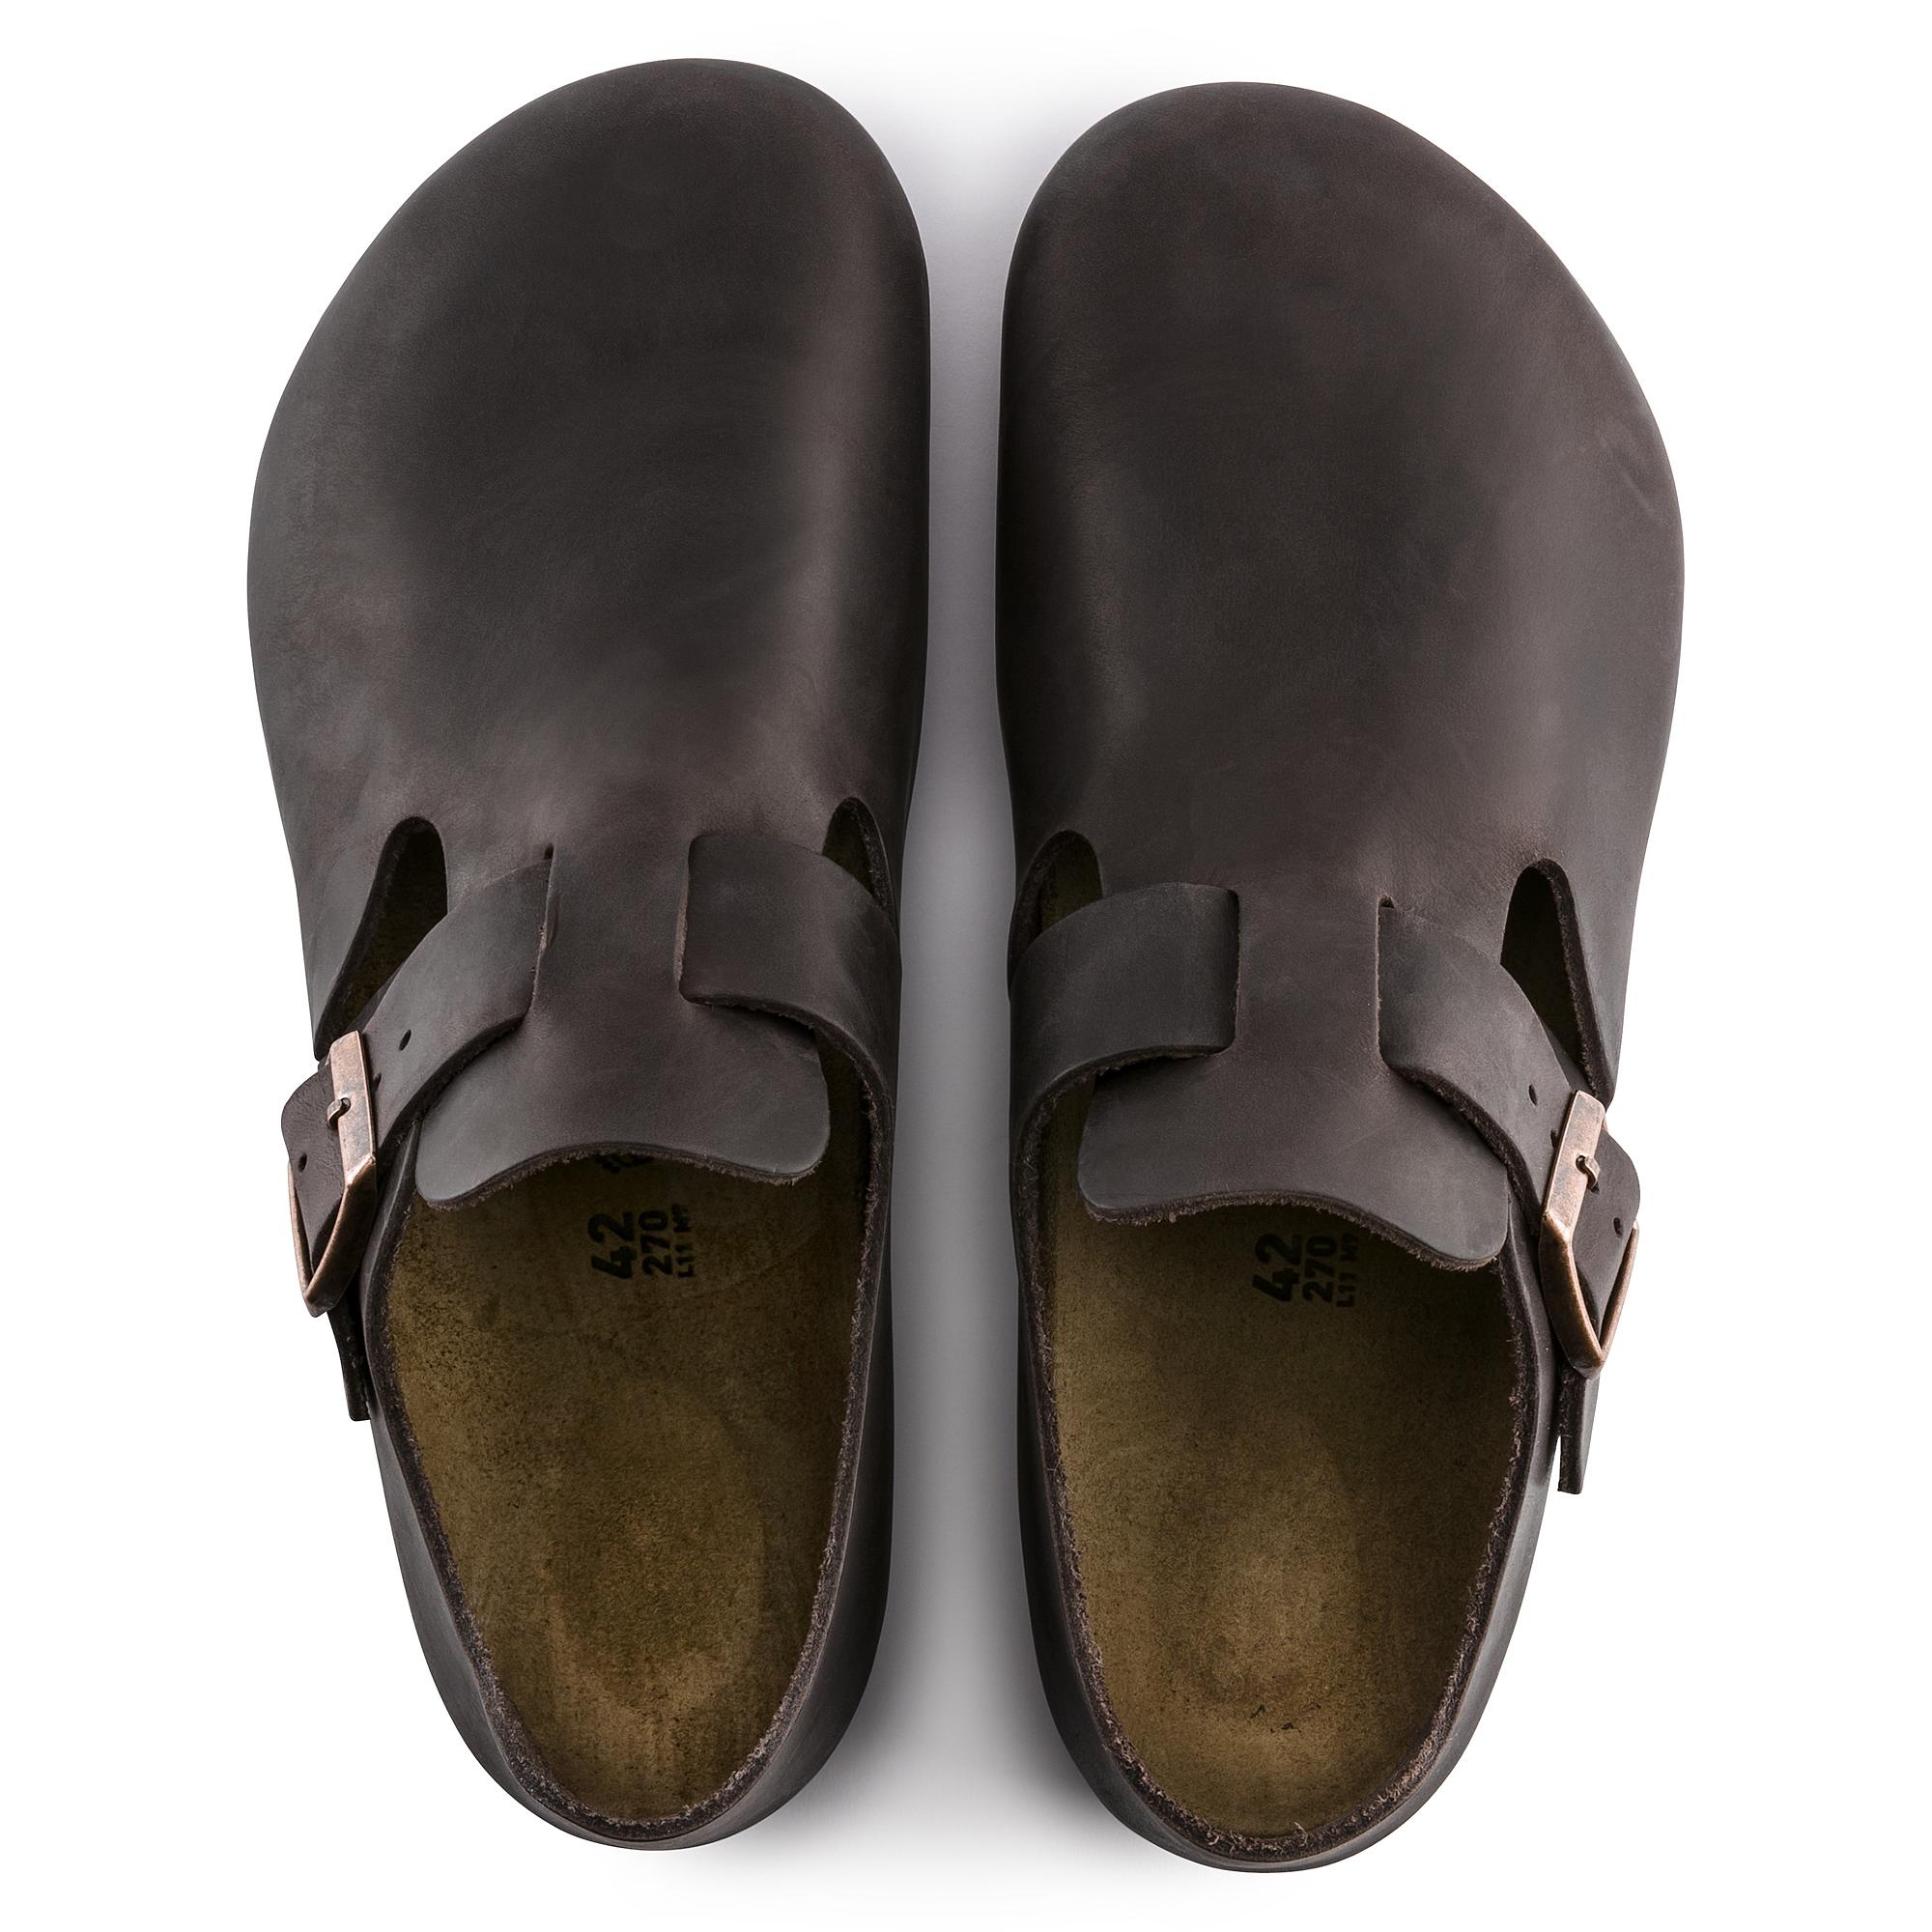 f4daaf17b93a43 ... London Oiled Leather Habana ...